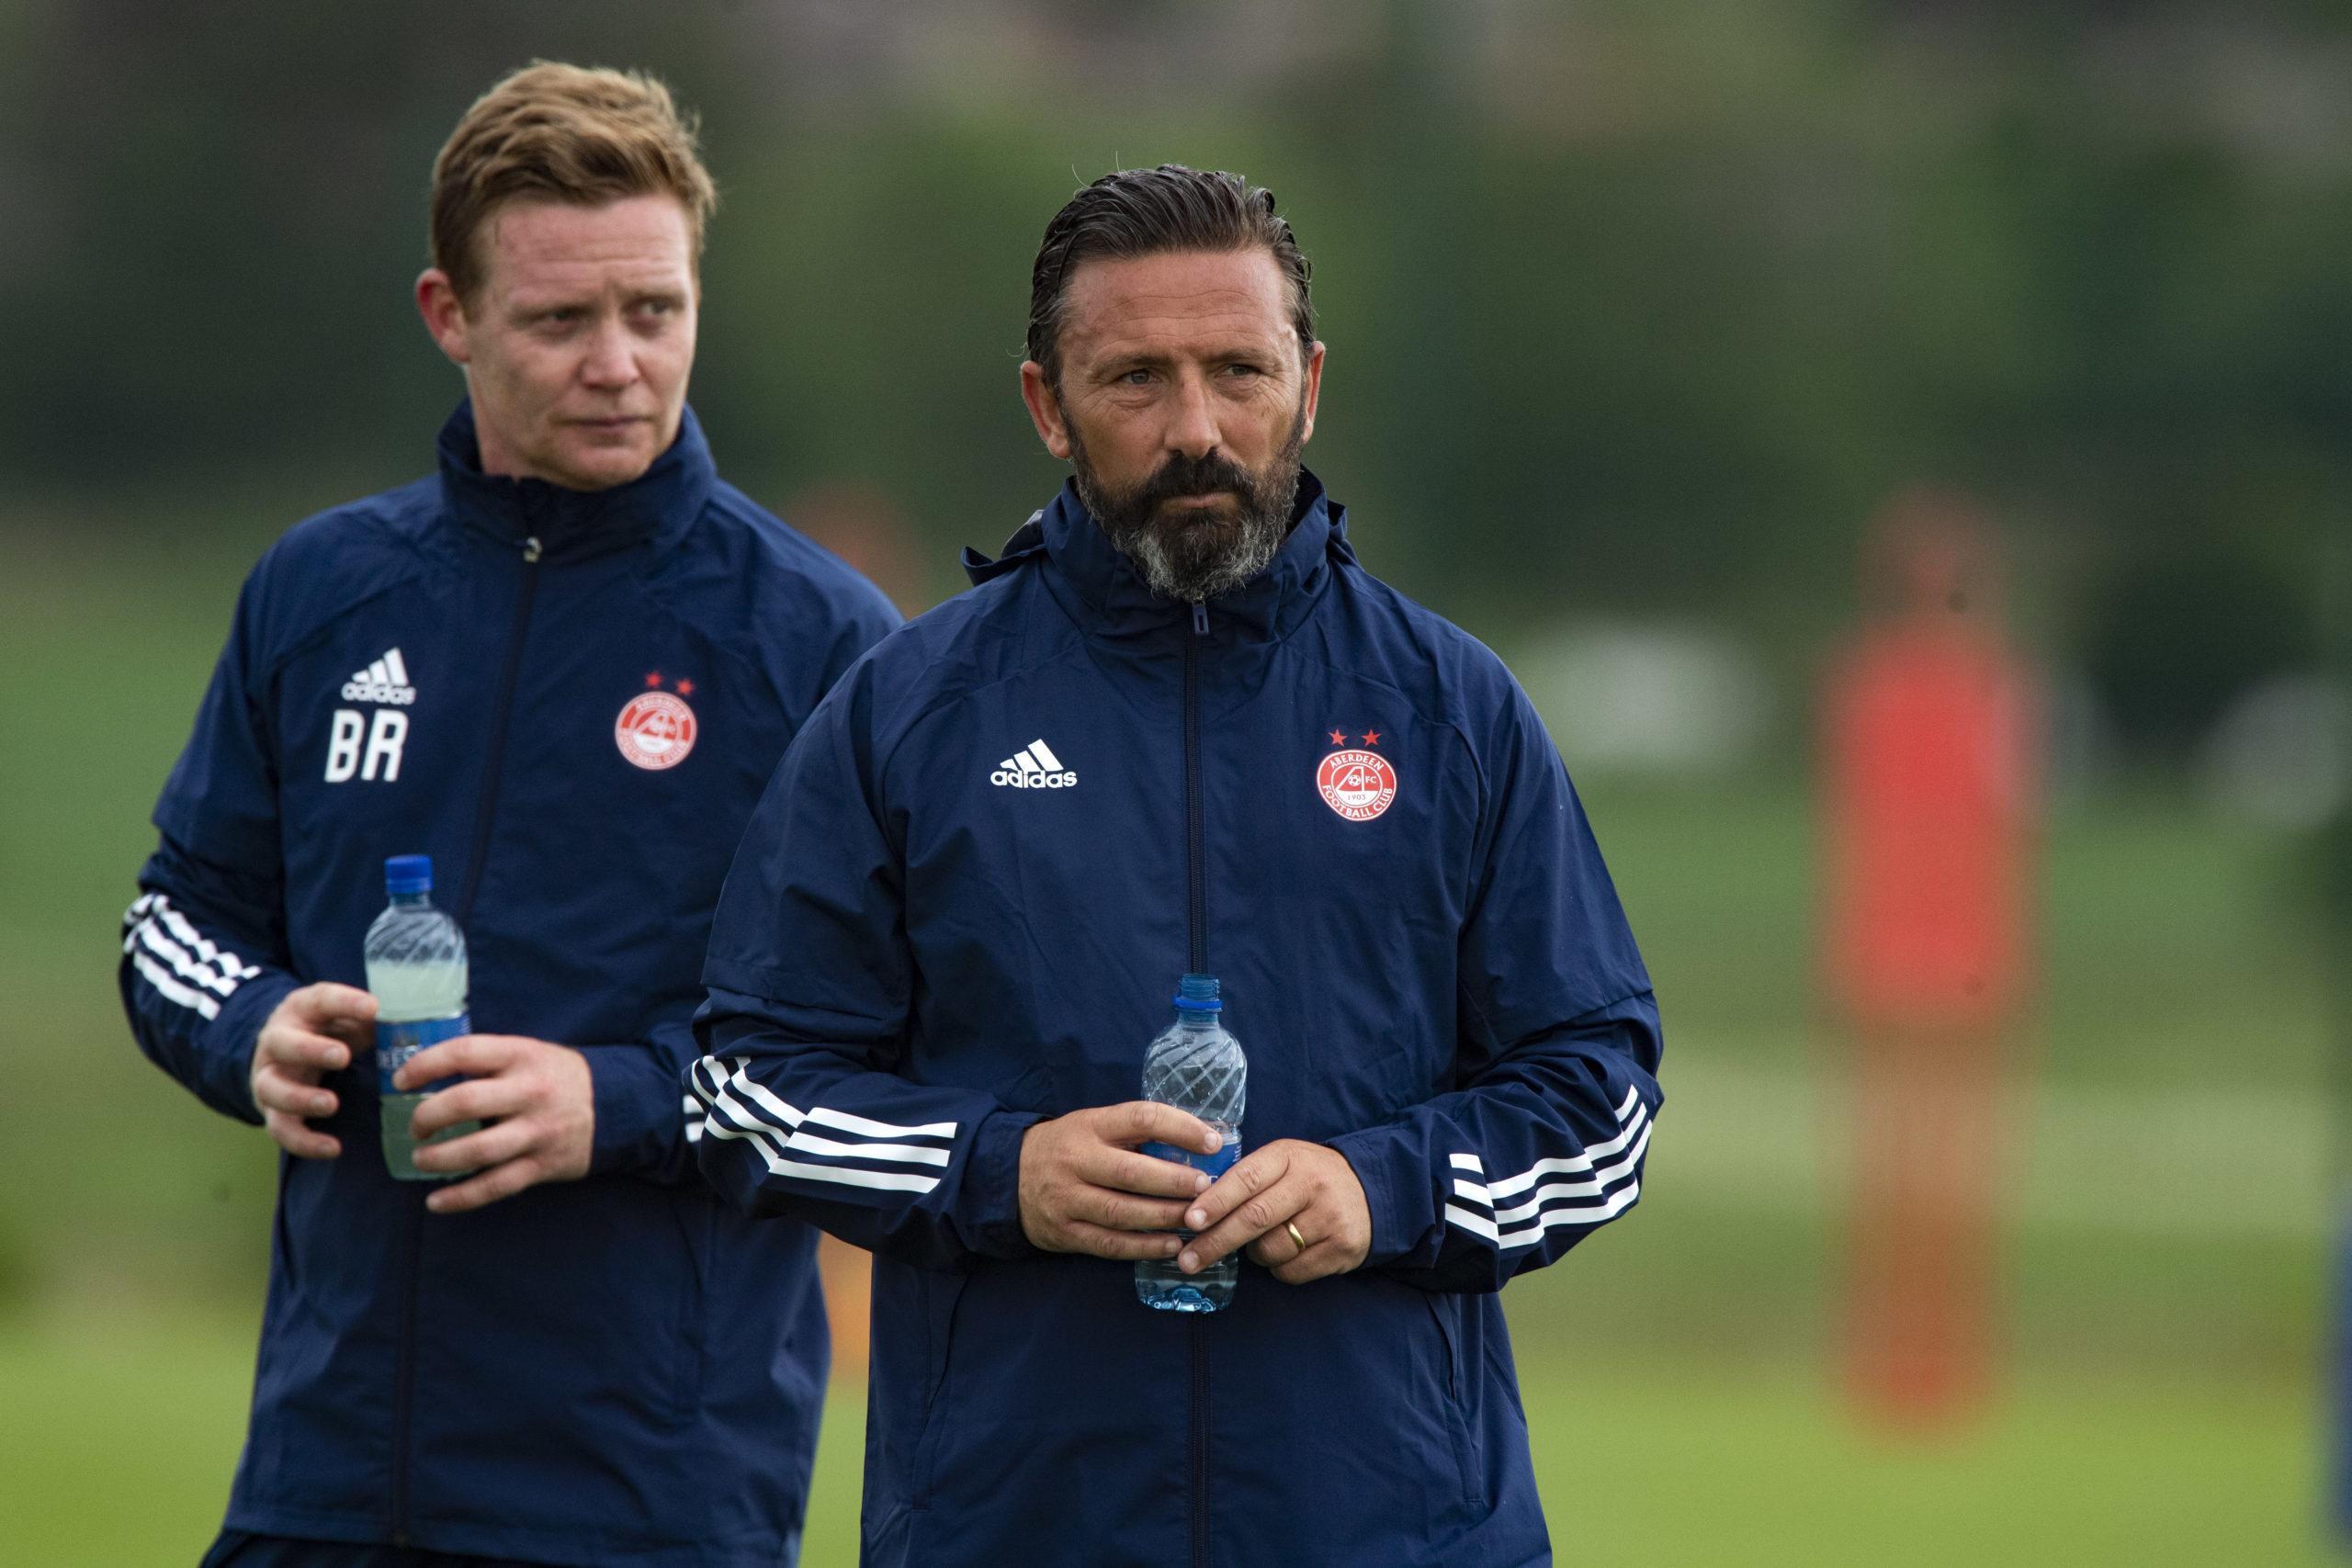 Derek McInnes with Aberdeen coach Barry Robson.